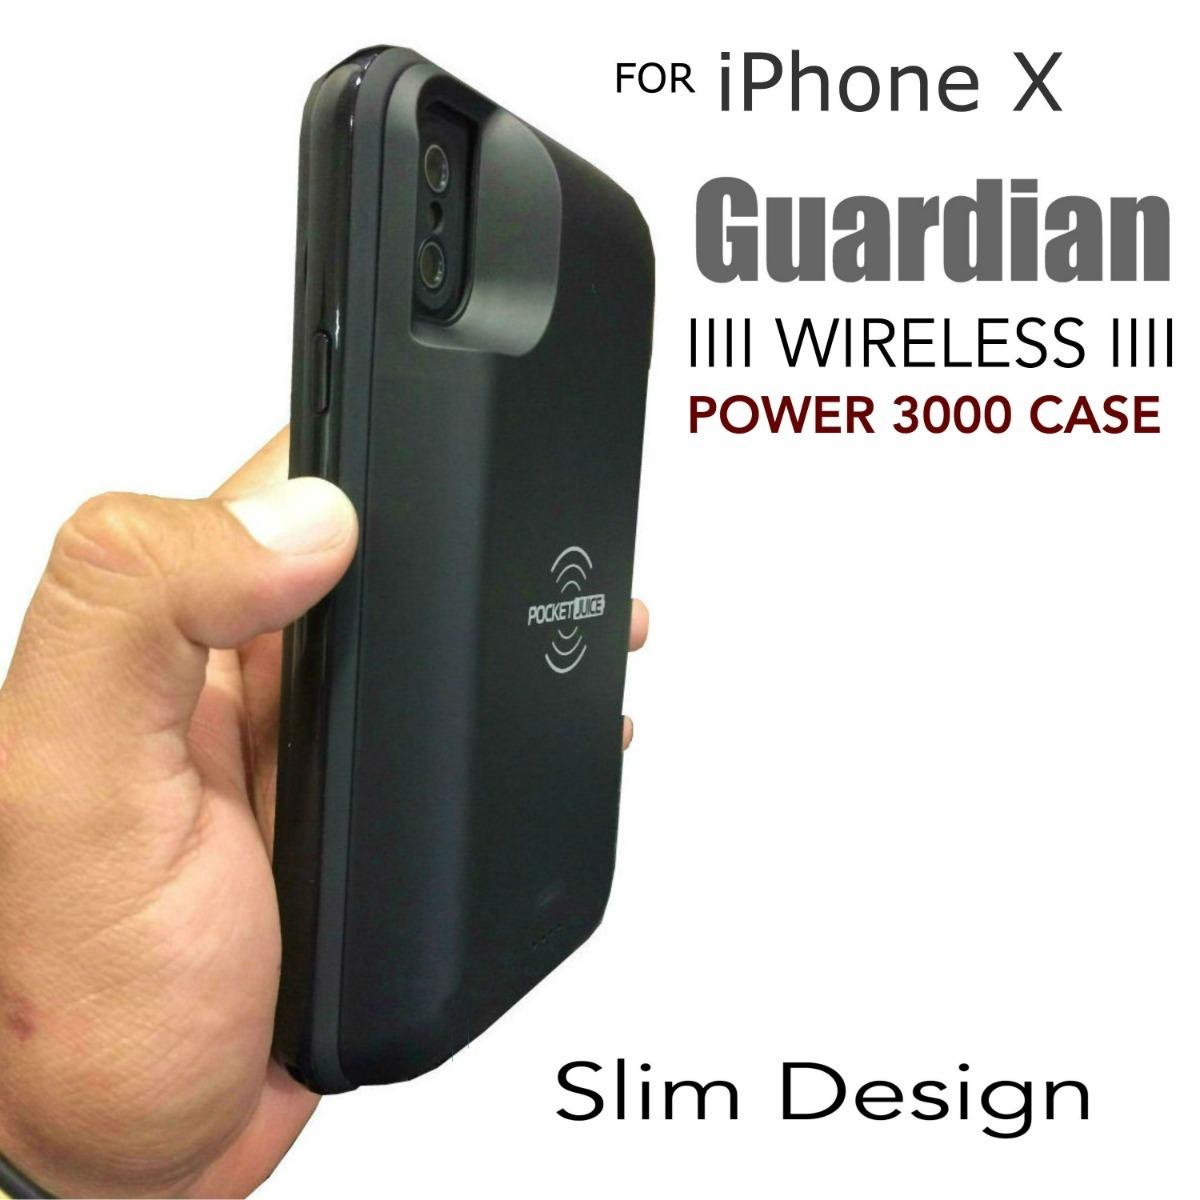 huge discount b0248 a57f3 Funda + Bateria iPhone X Guardian Wireless Power 3000 Case